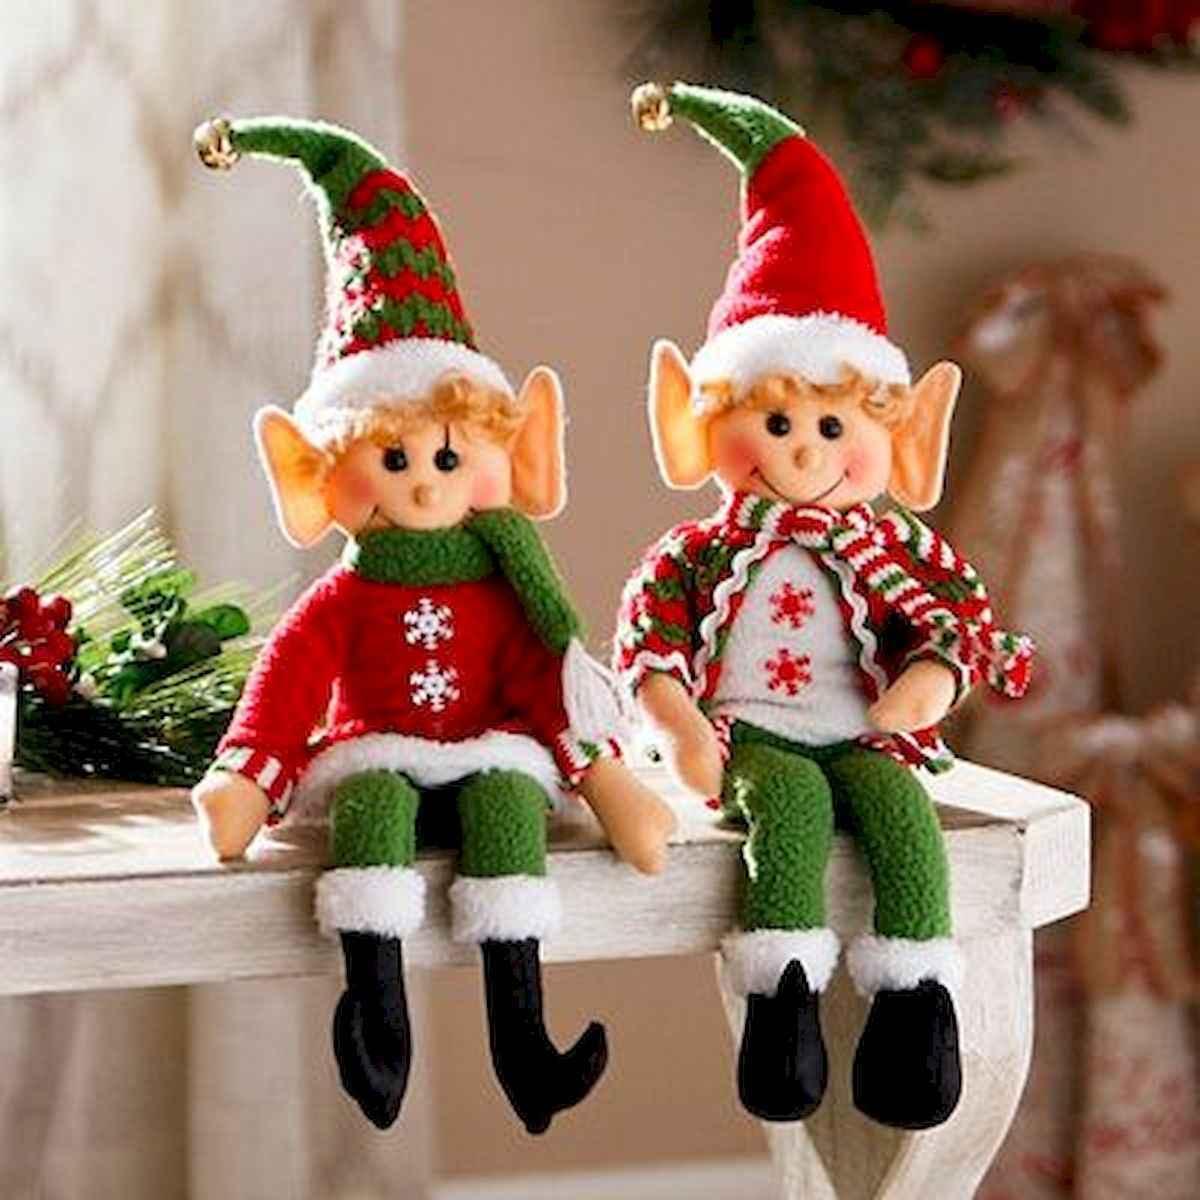 40 unique christmas tree ideas decorations (15)